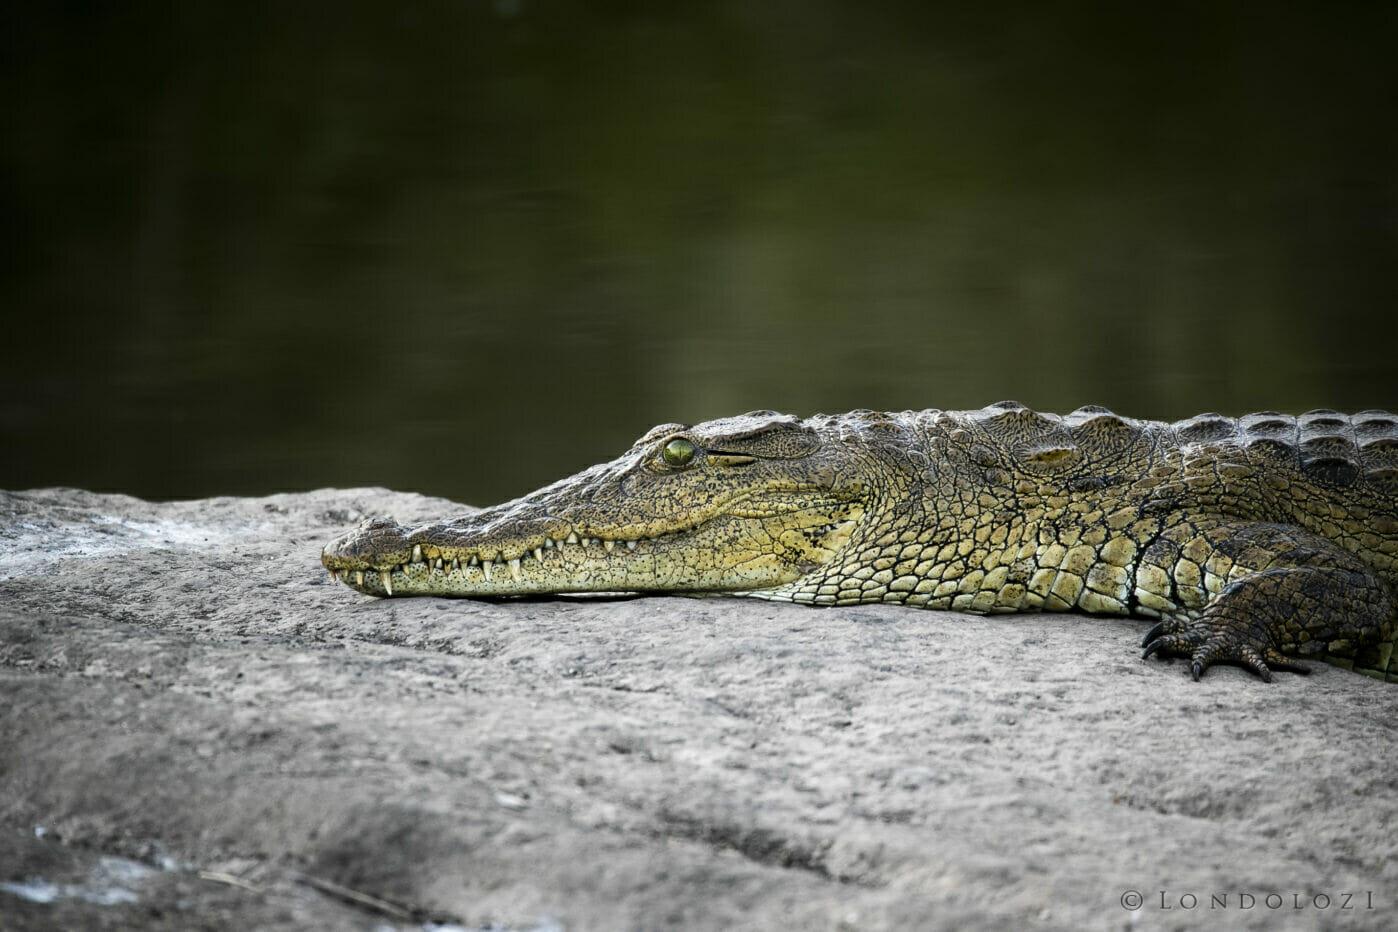 Crocodile sunbathing dark background